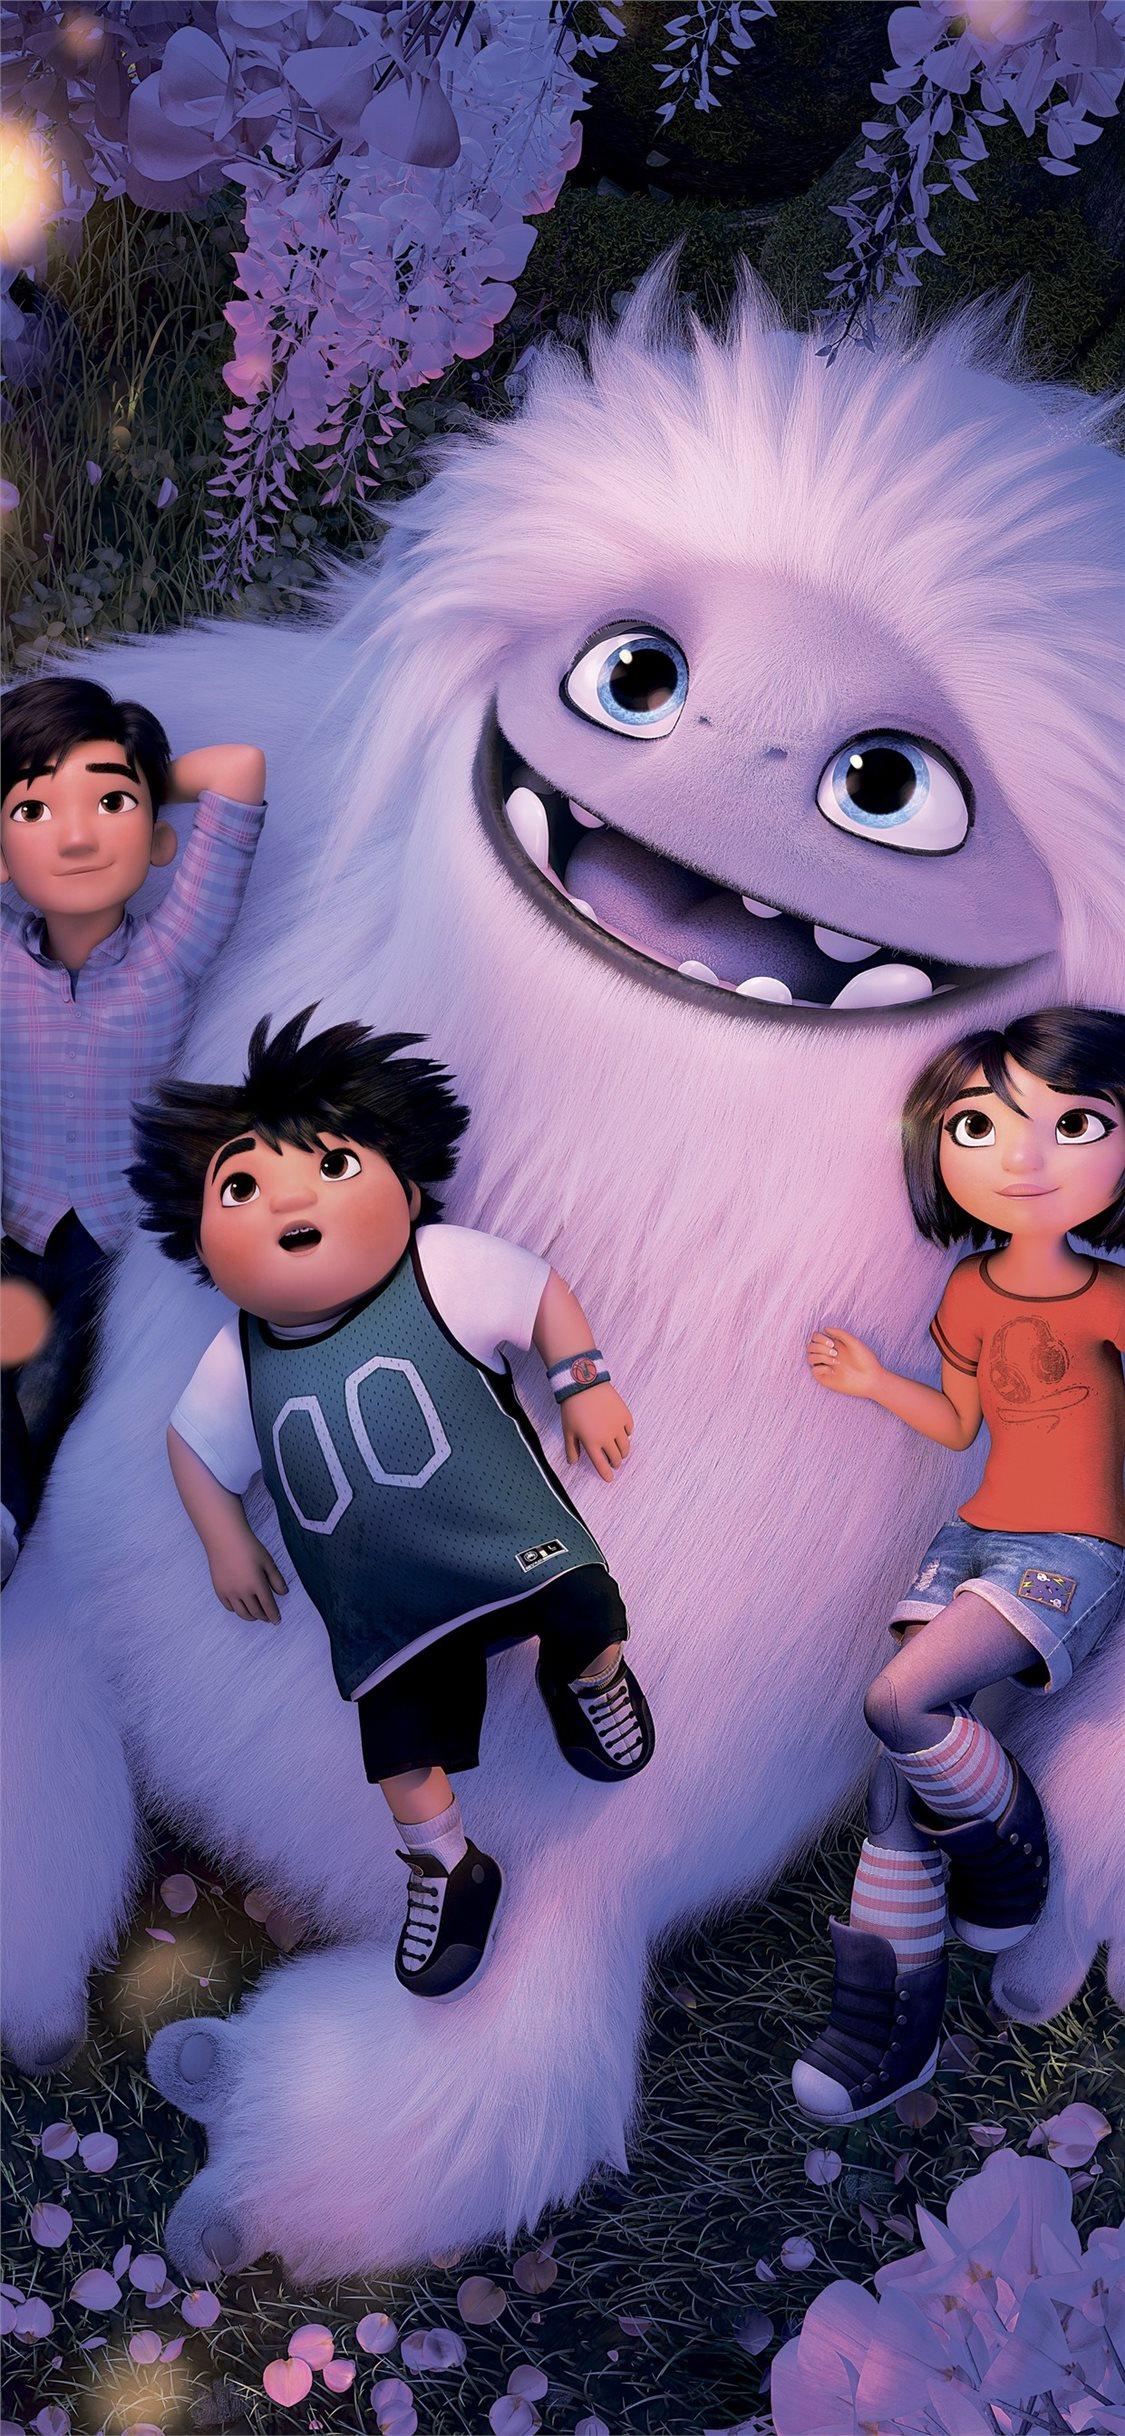 abominable animated movie 8k iPhone X